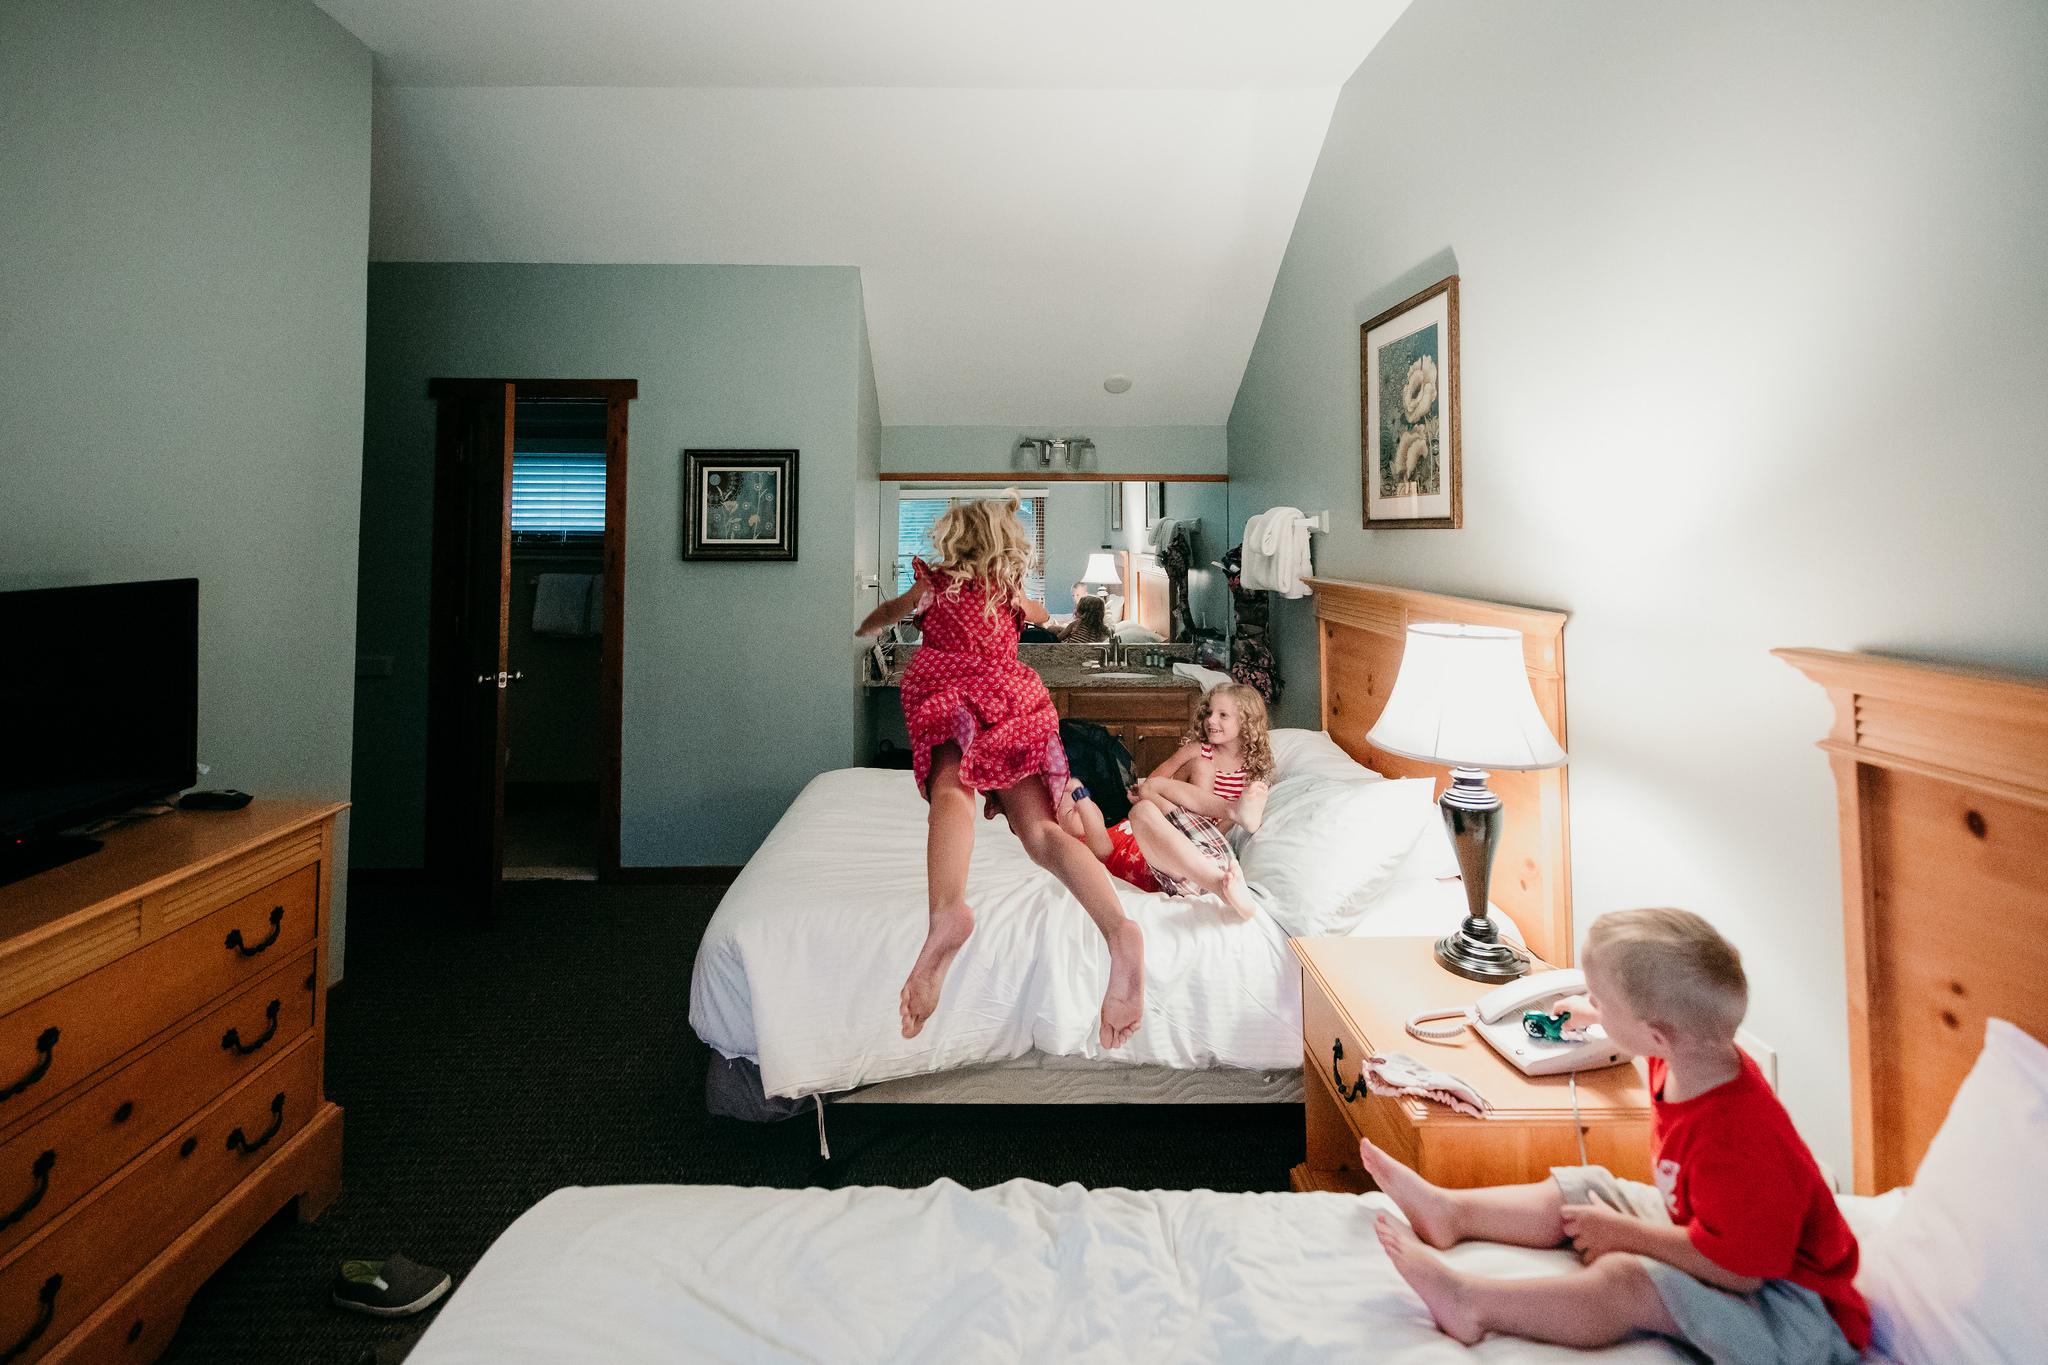 hello-olivia-photography-family-photojournalism-365-tutorial-documenting-bedtime-rituals-lowlight-kids-documentary-and lifestyle-photographer-long-island-new-york33.jpg